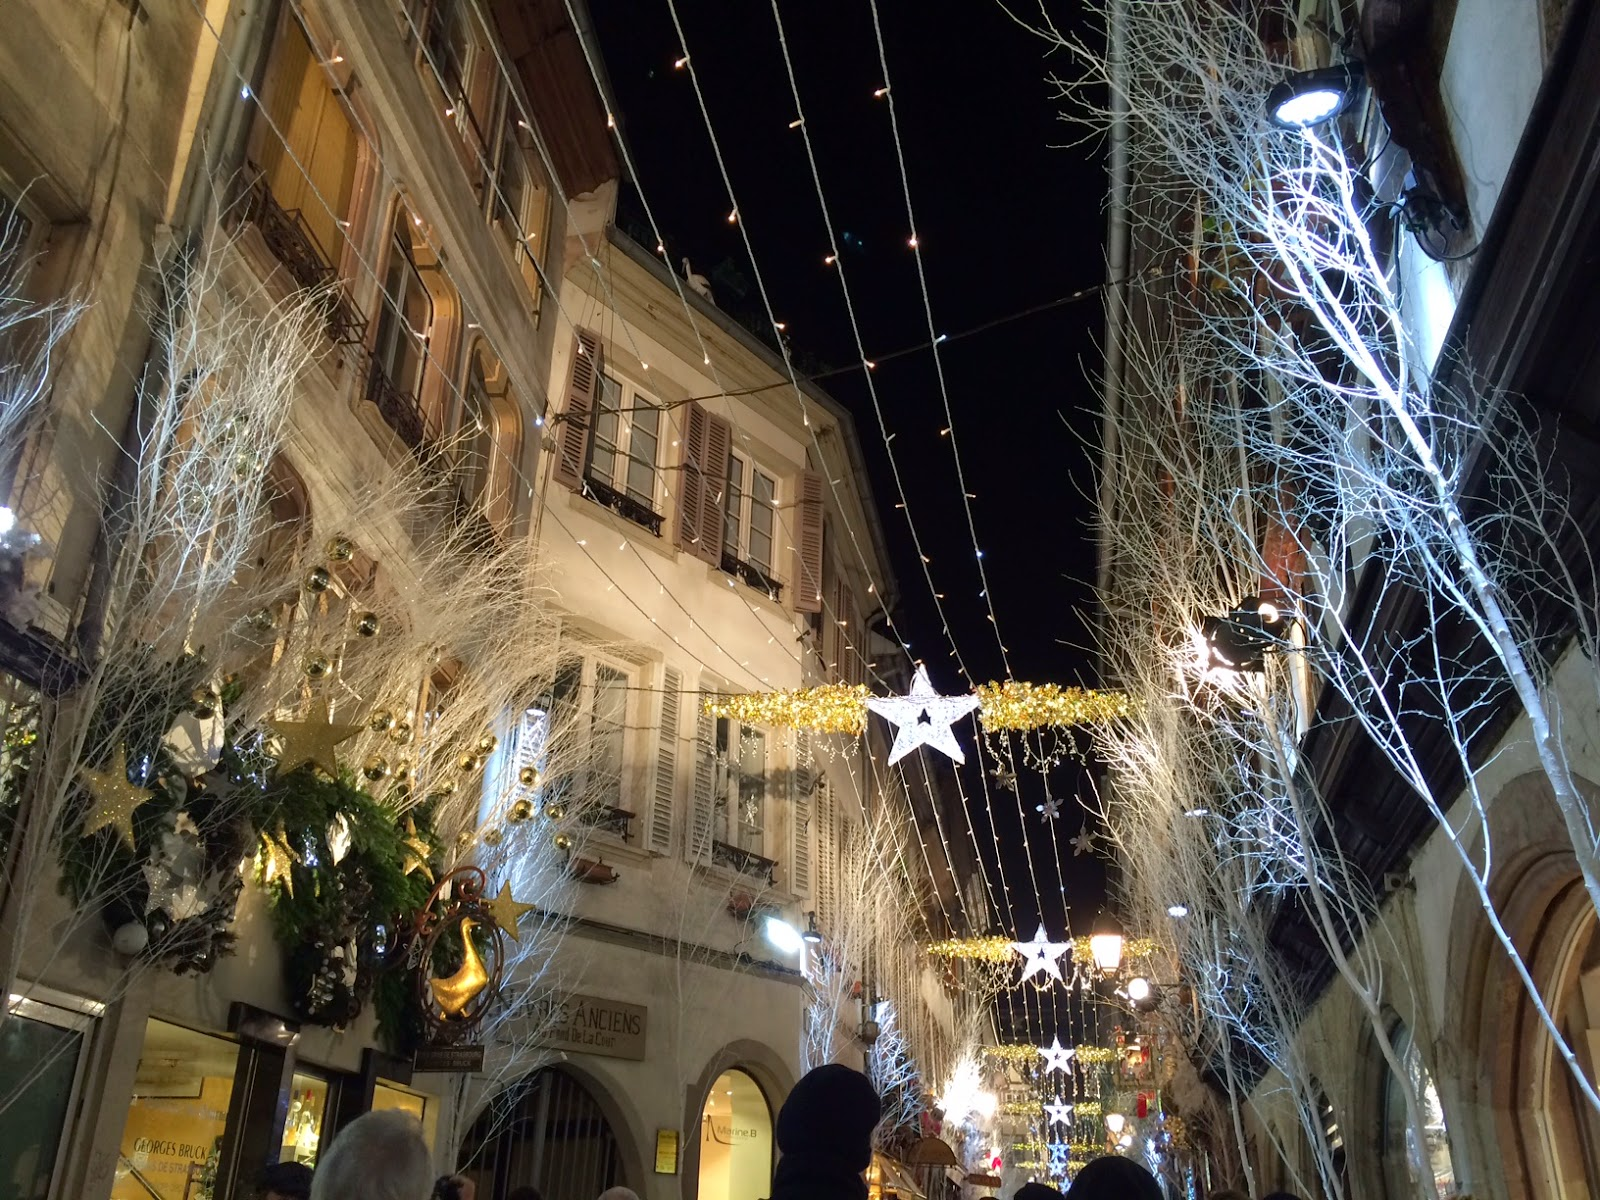 Christmas lights in Strasbourg, France